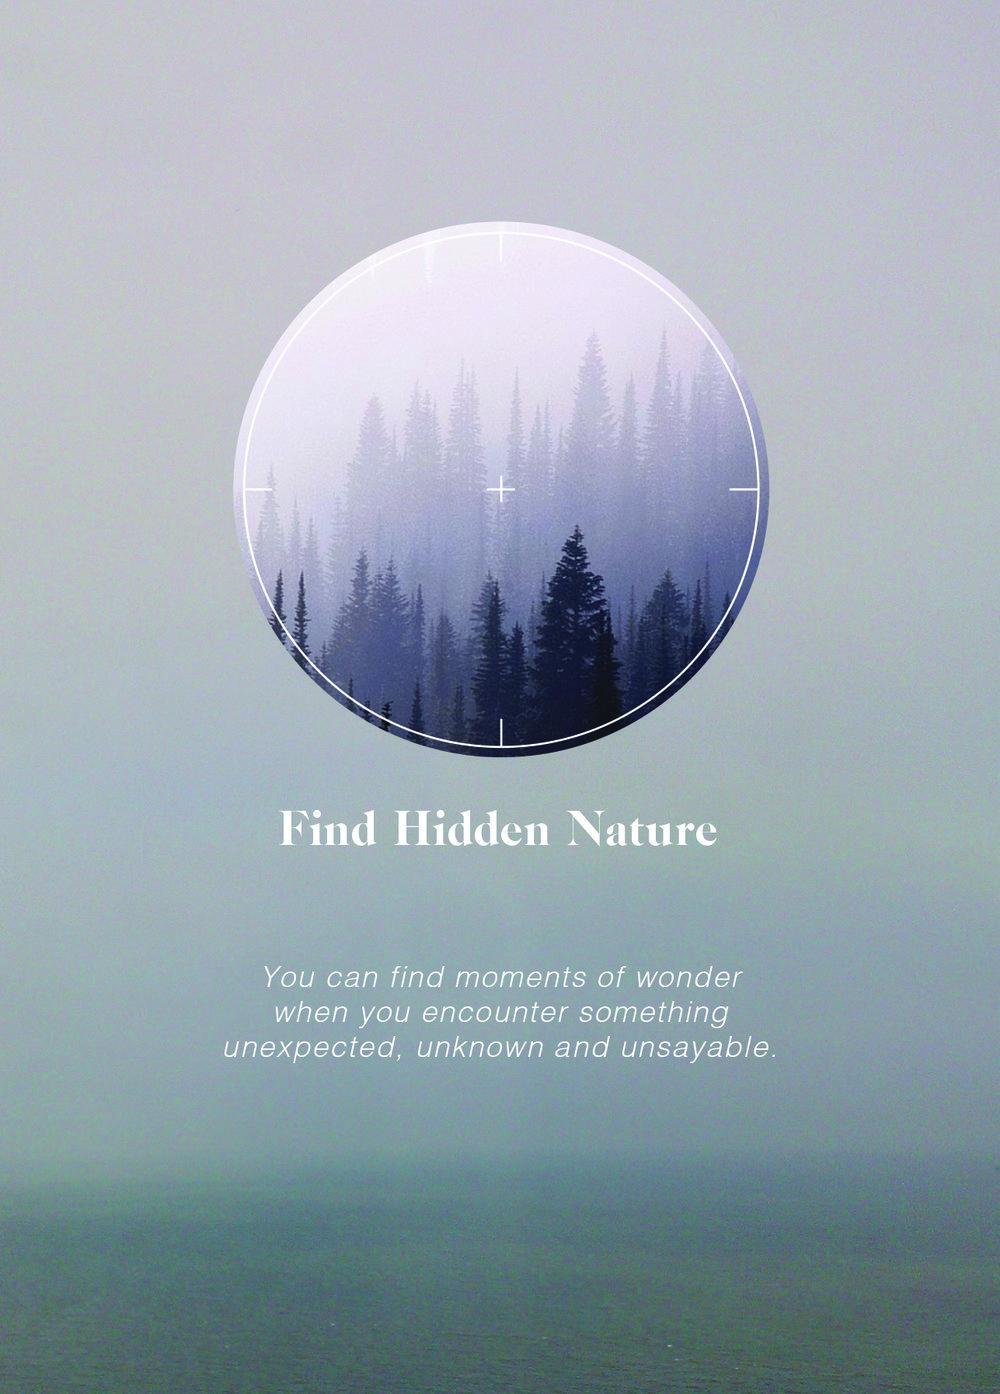 Find Hidden Nature